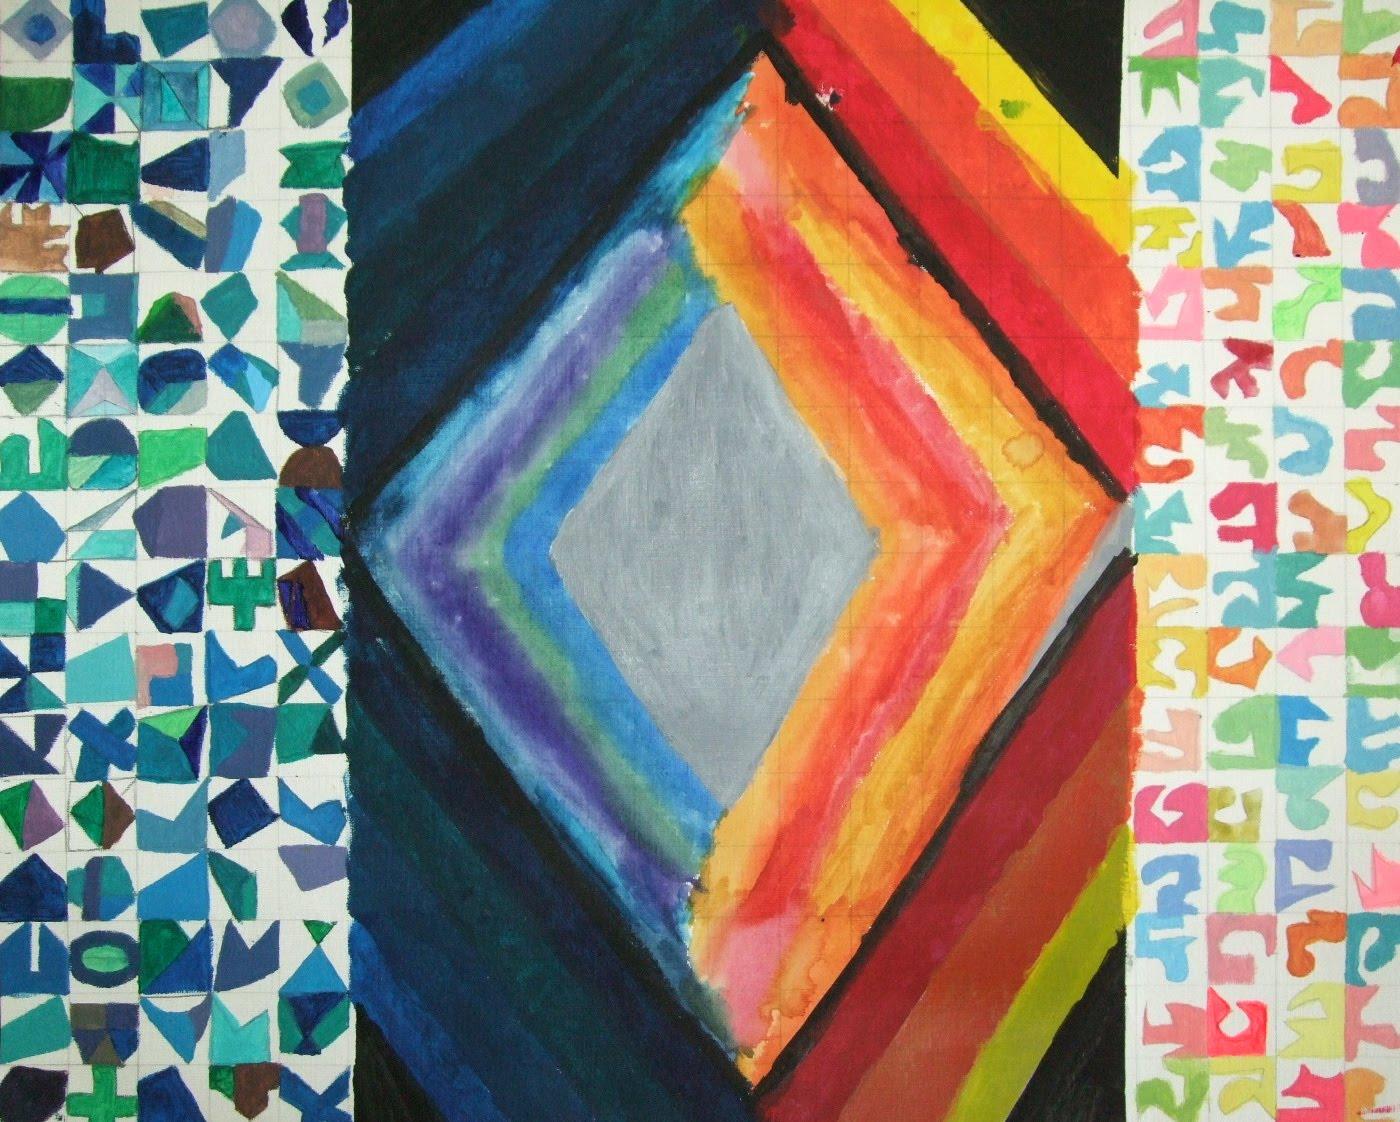 Highschoolart Geometric And Organic Shapes High School Art